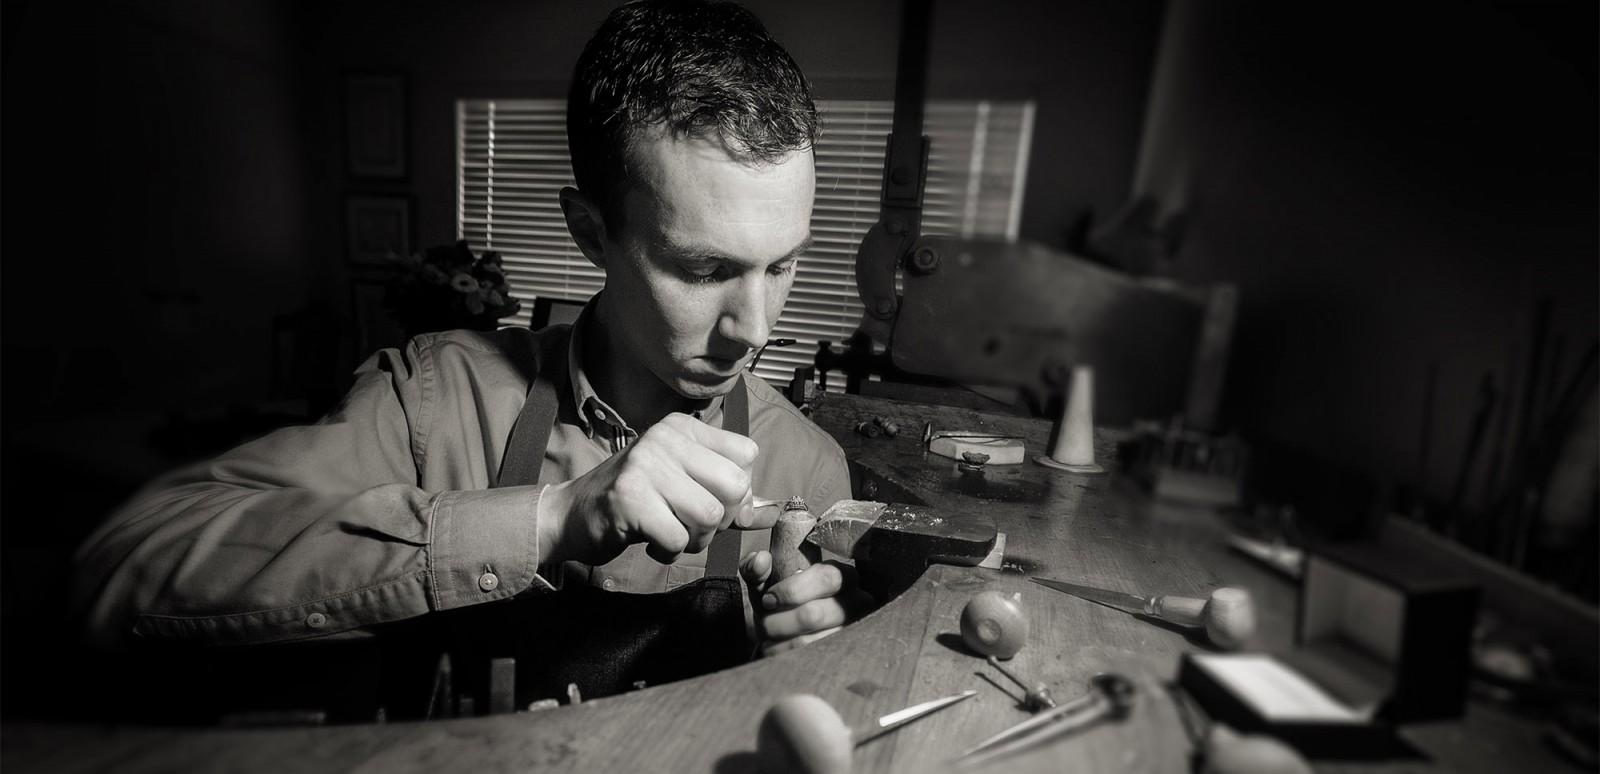 Auckand jewellery designer Julian Bartrom, working on custom made jewellery and custom engagement ring design